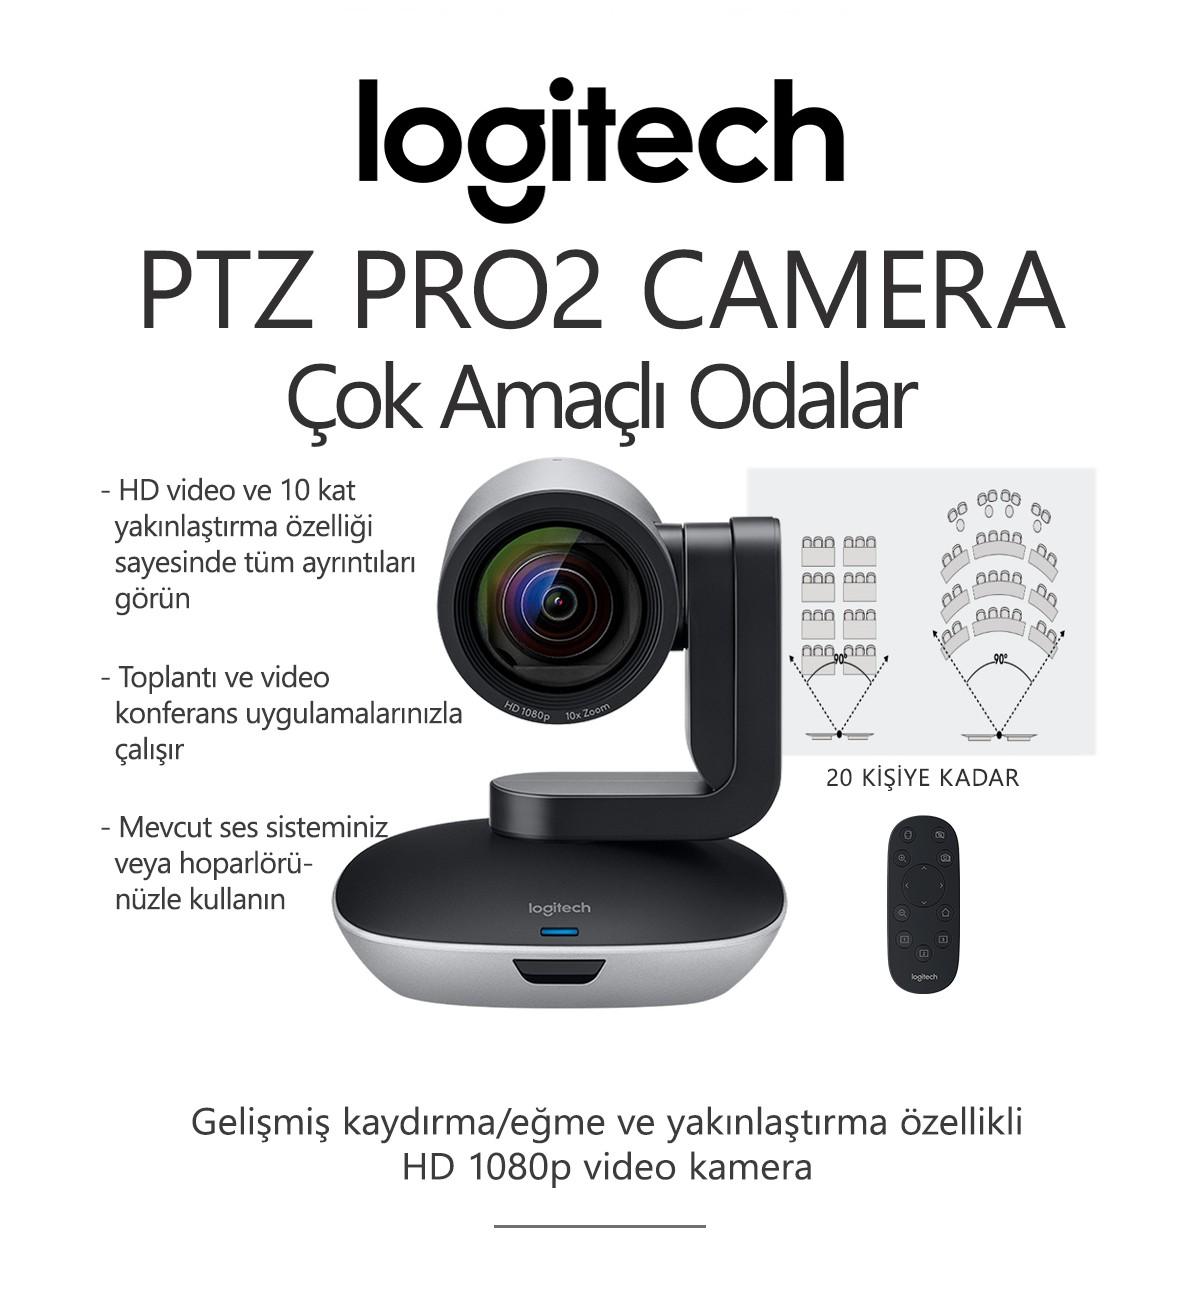 Logitech PTZ PRO2 CAMERA Konferans Sistemi